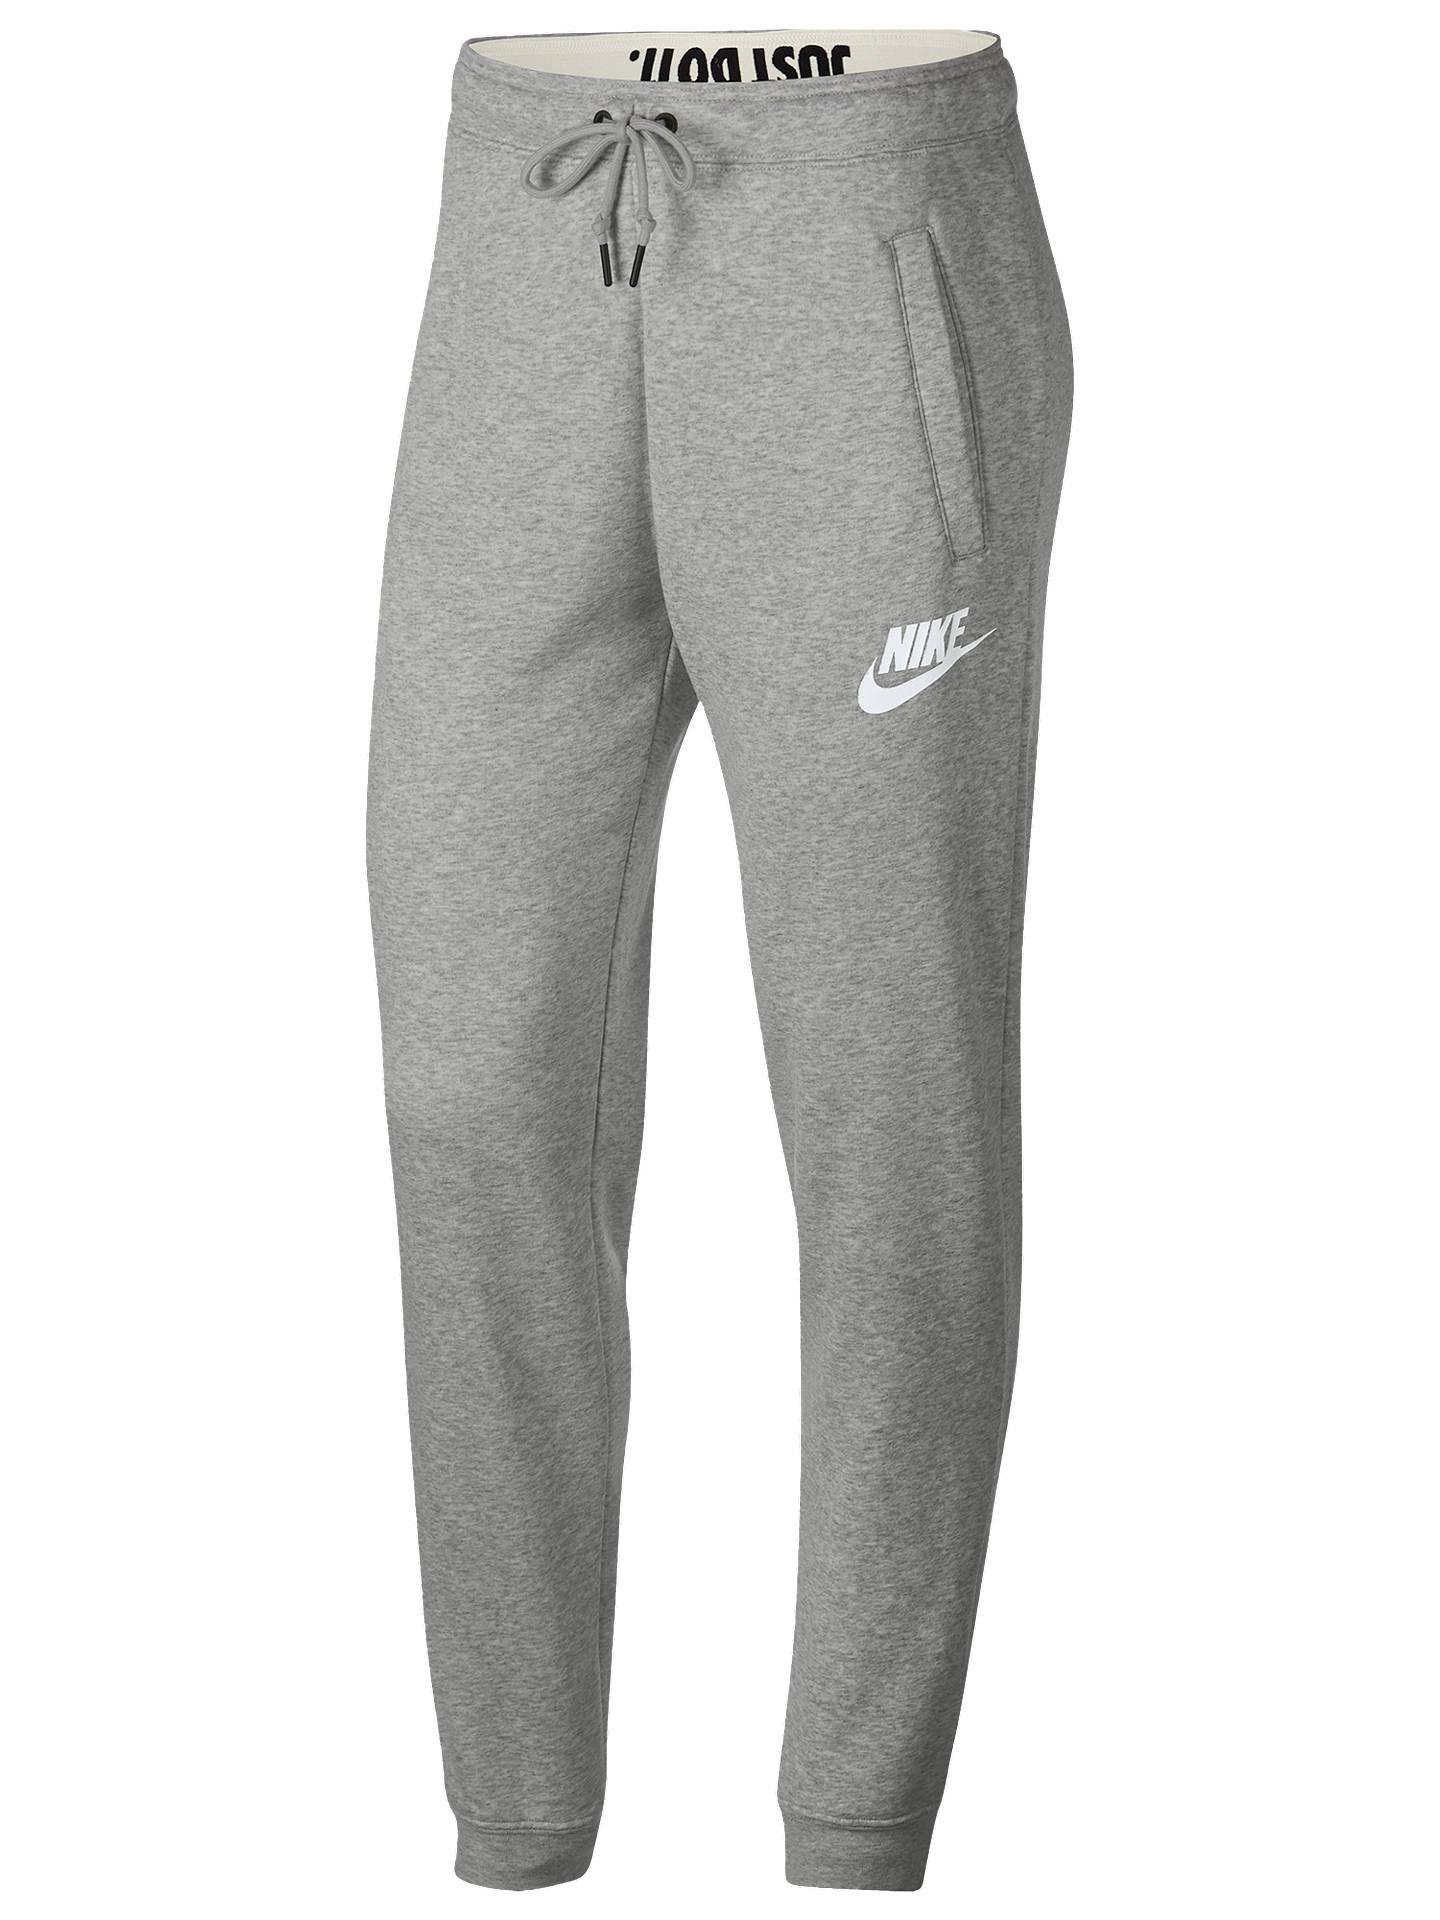 Nike Sportswear Rally Tracksuit Bottoms, Grey Heather/Pale Grey/White at  John Lewis & Partners